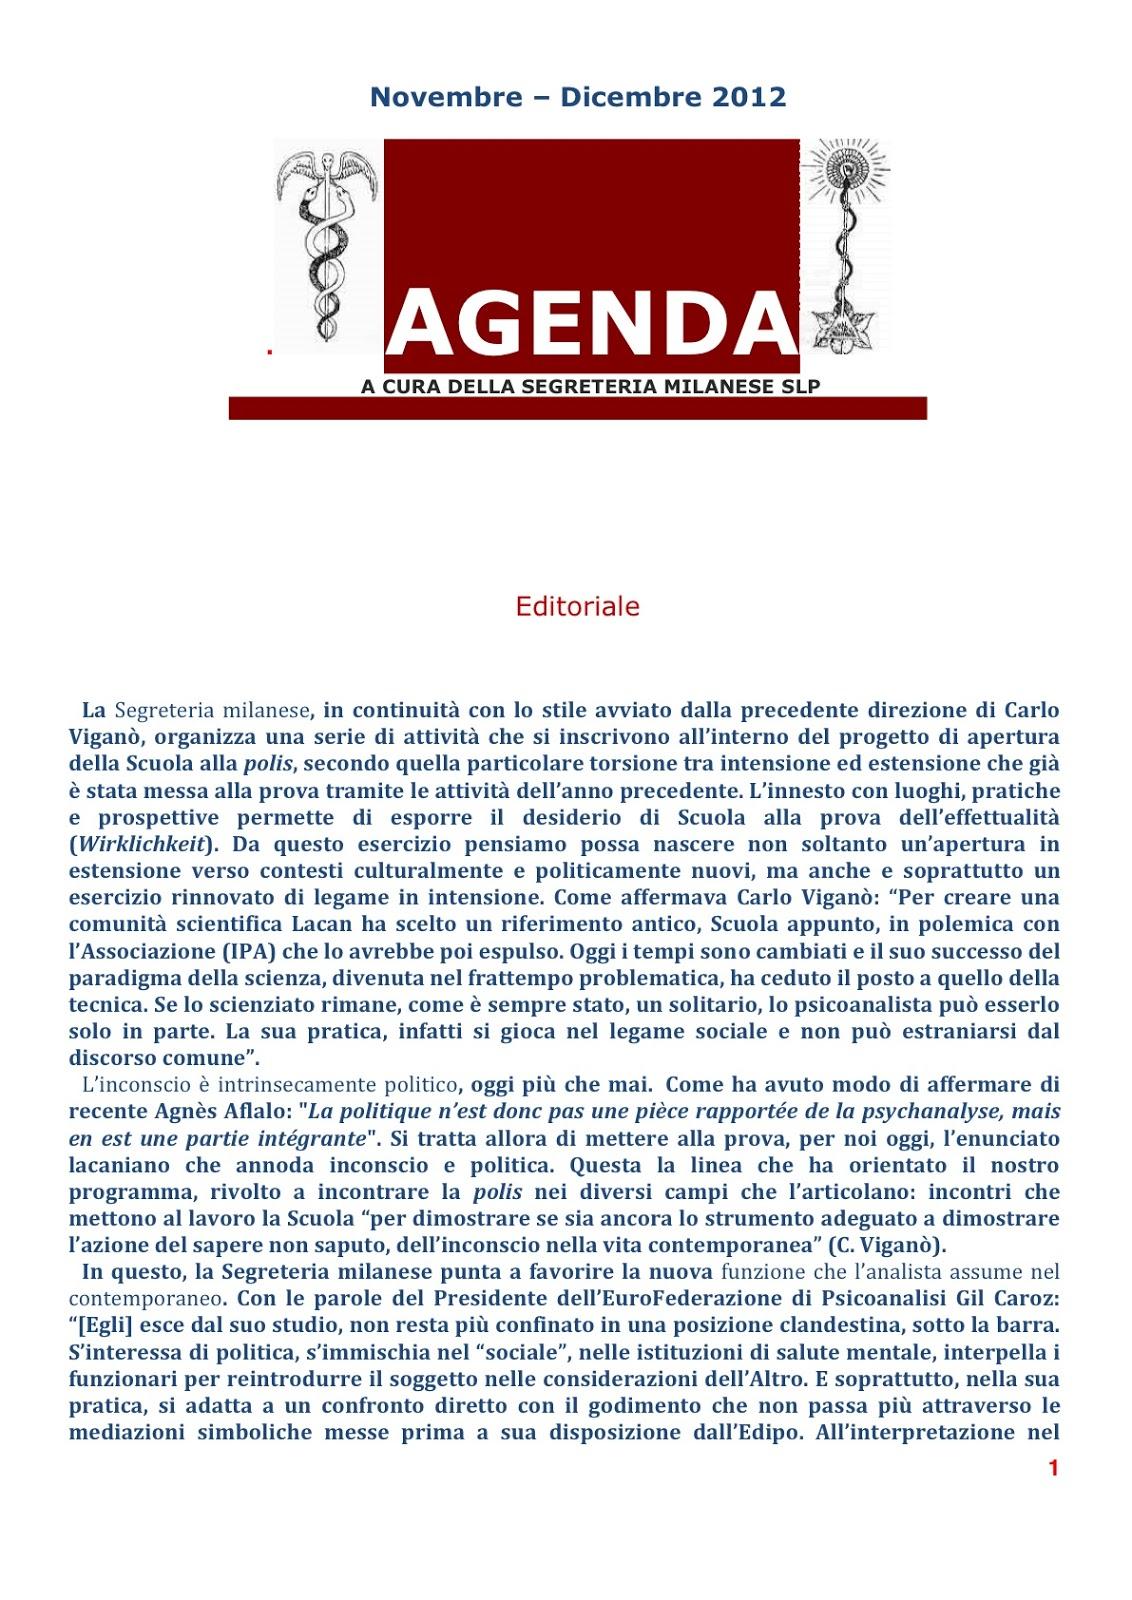 http://4.bp.blogspot.com/-hWW-l6fuiE4/UKKeeJ4p5kI/AAAAAAAAAnw/Kacj88mfKUw/s1600/Agenda+1.2012.jpg